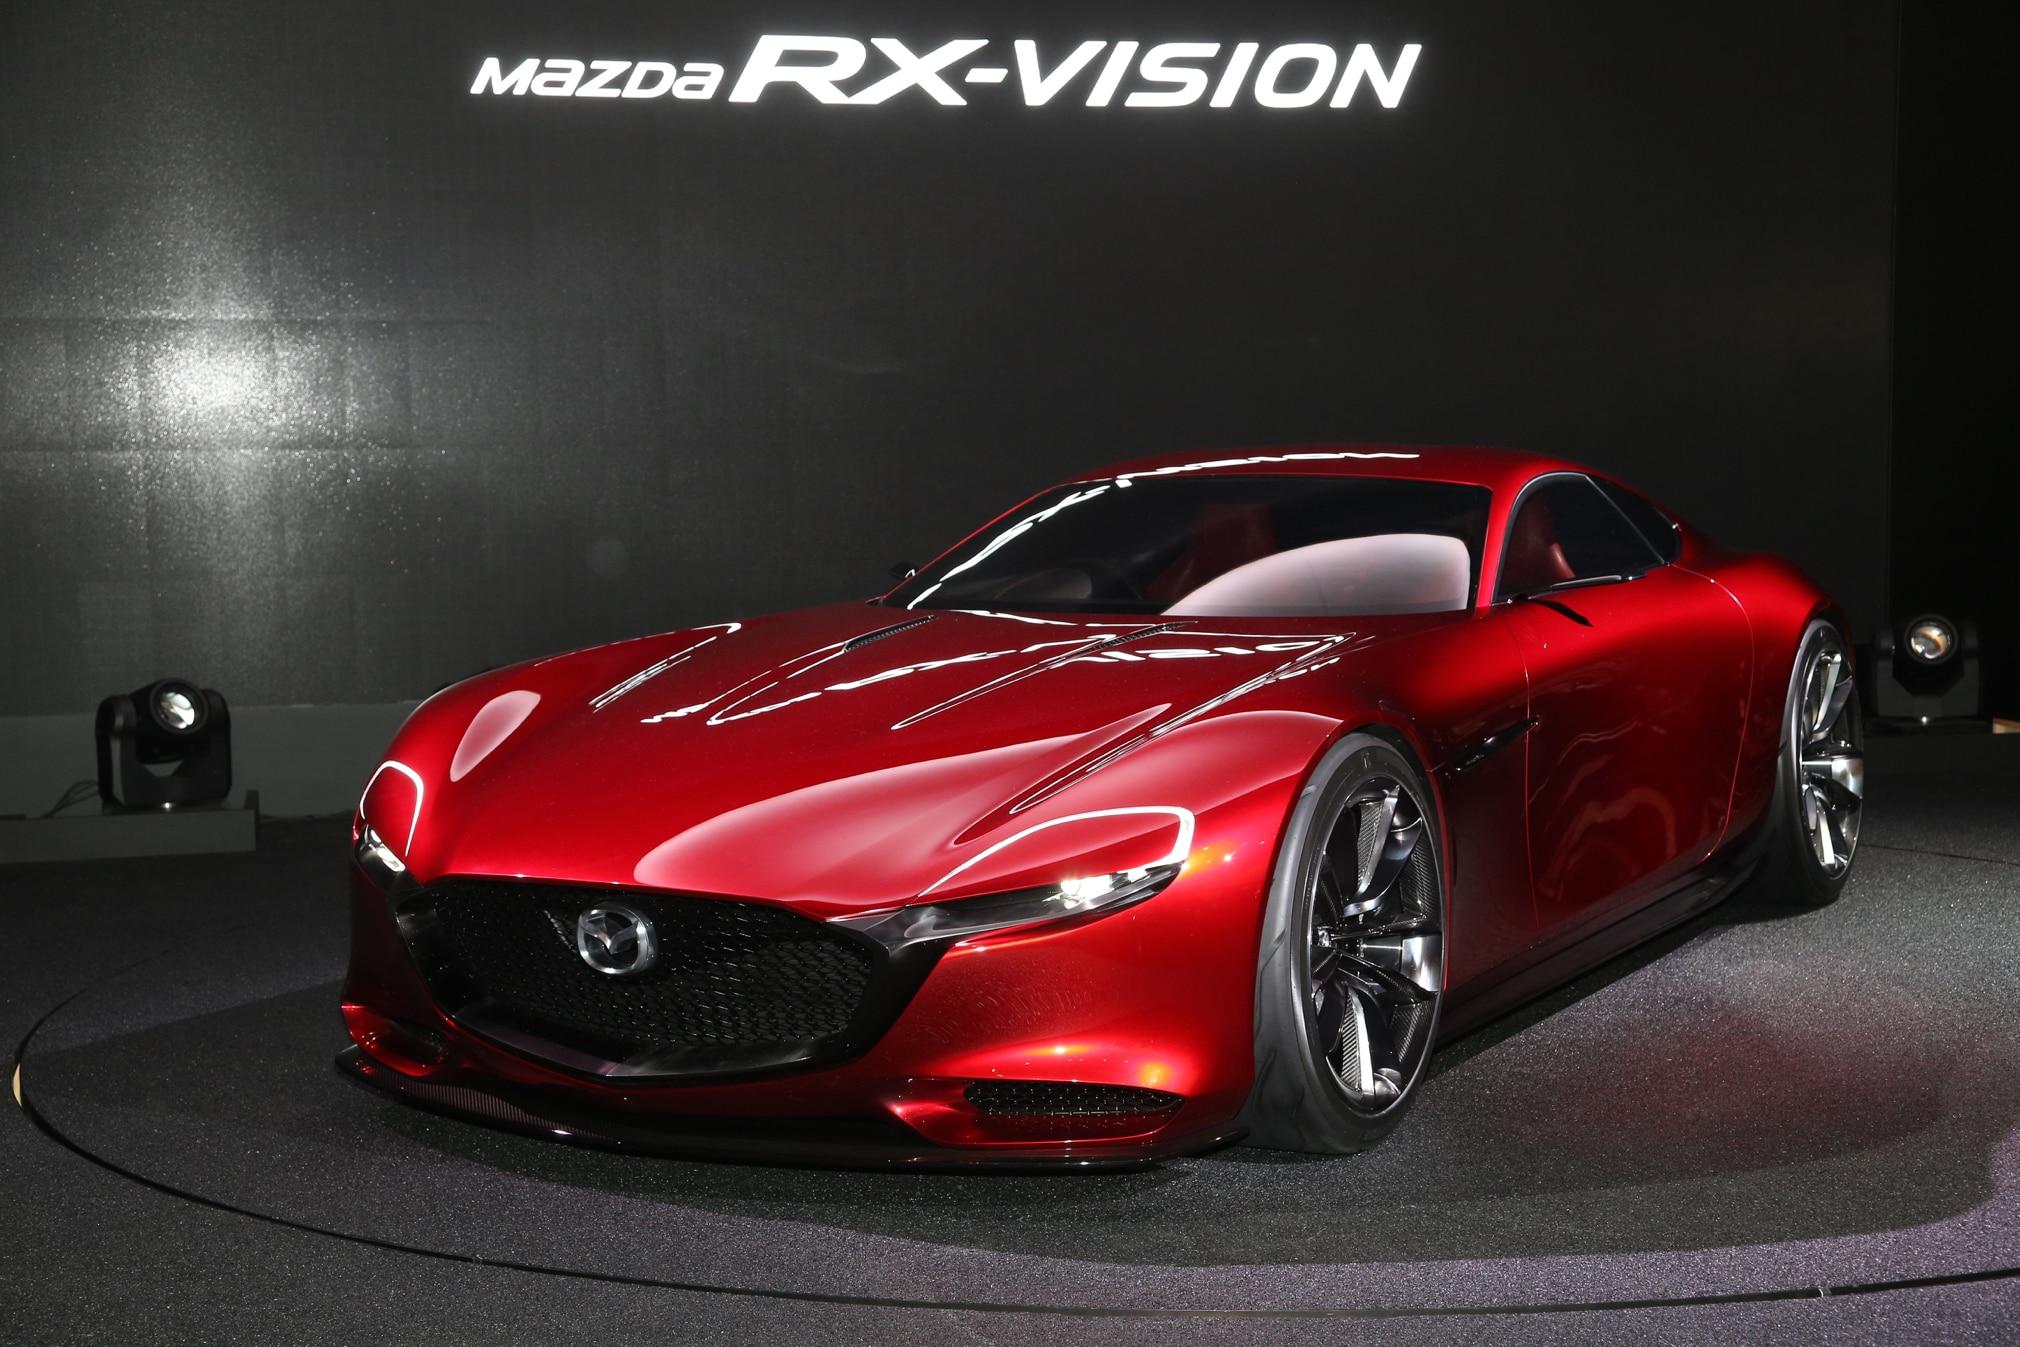 By Design: Mazda RX-Vision Concept